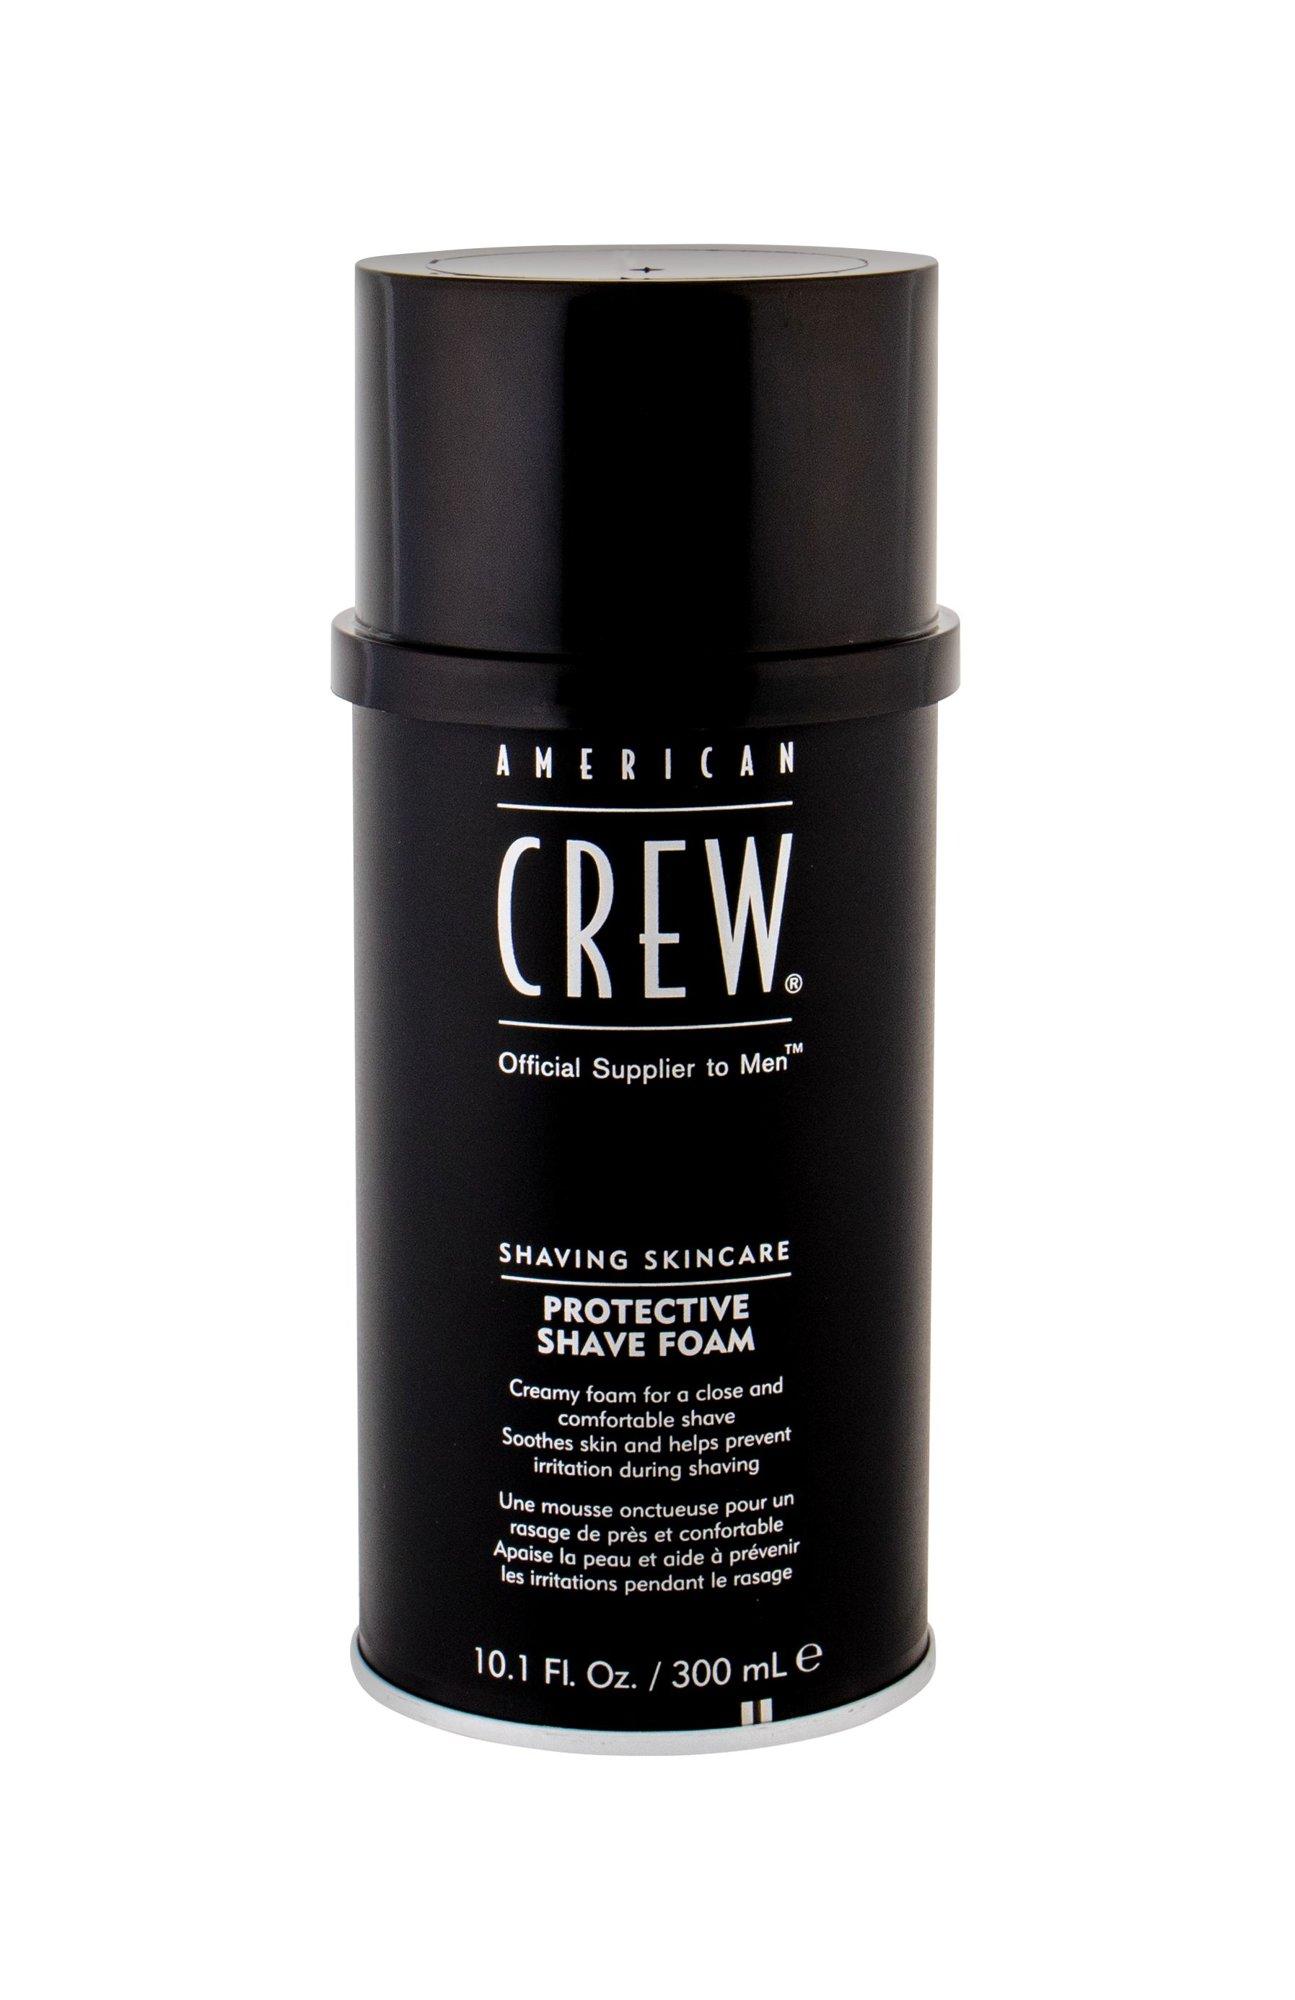 American Crew Shaving Skincare Shaving Foam 300ml  Protective Shave Foam